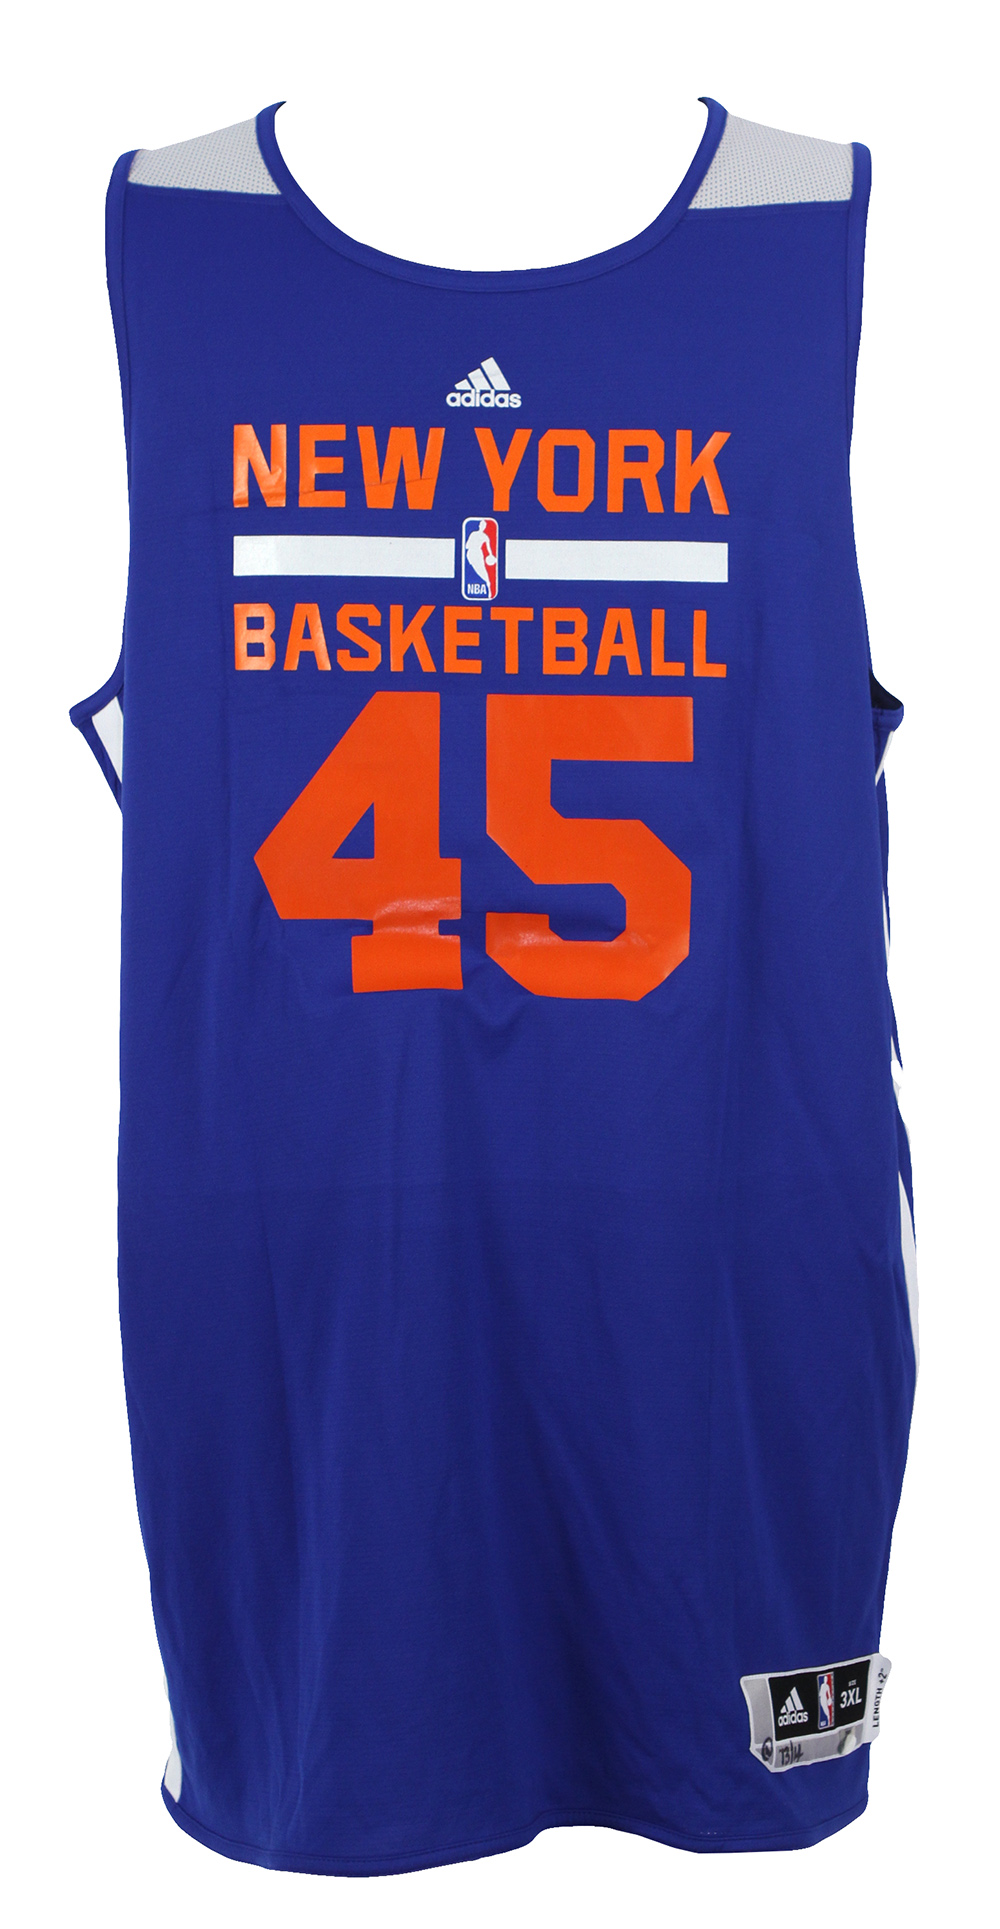 more photos 0efc5 f3ccf Lot Detail - 2013-14 Cole Aldrich New York Knicks Reversible ...